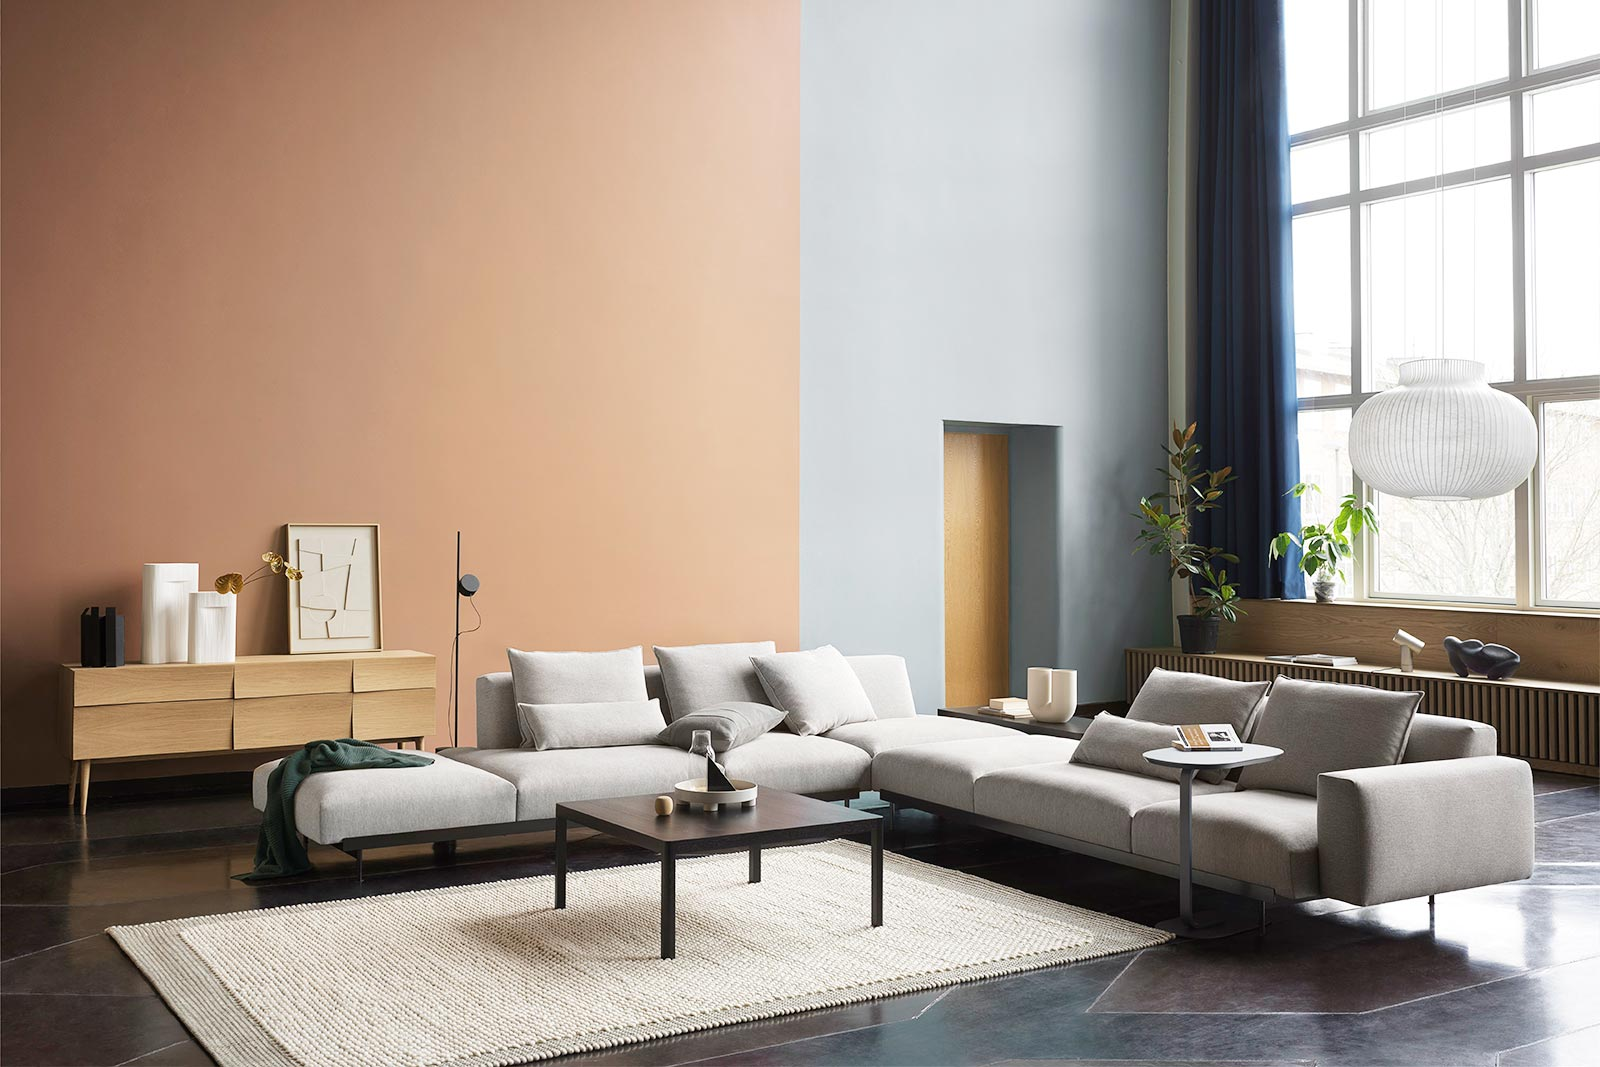 In Situ Sofa Muuto Boutique Danoise Basel Daenische Designer Moebel Accessoires Skandinavisches Wohnen